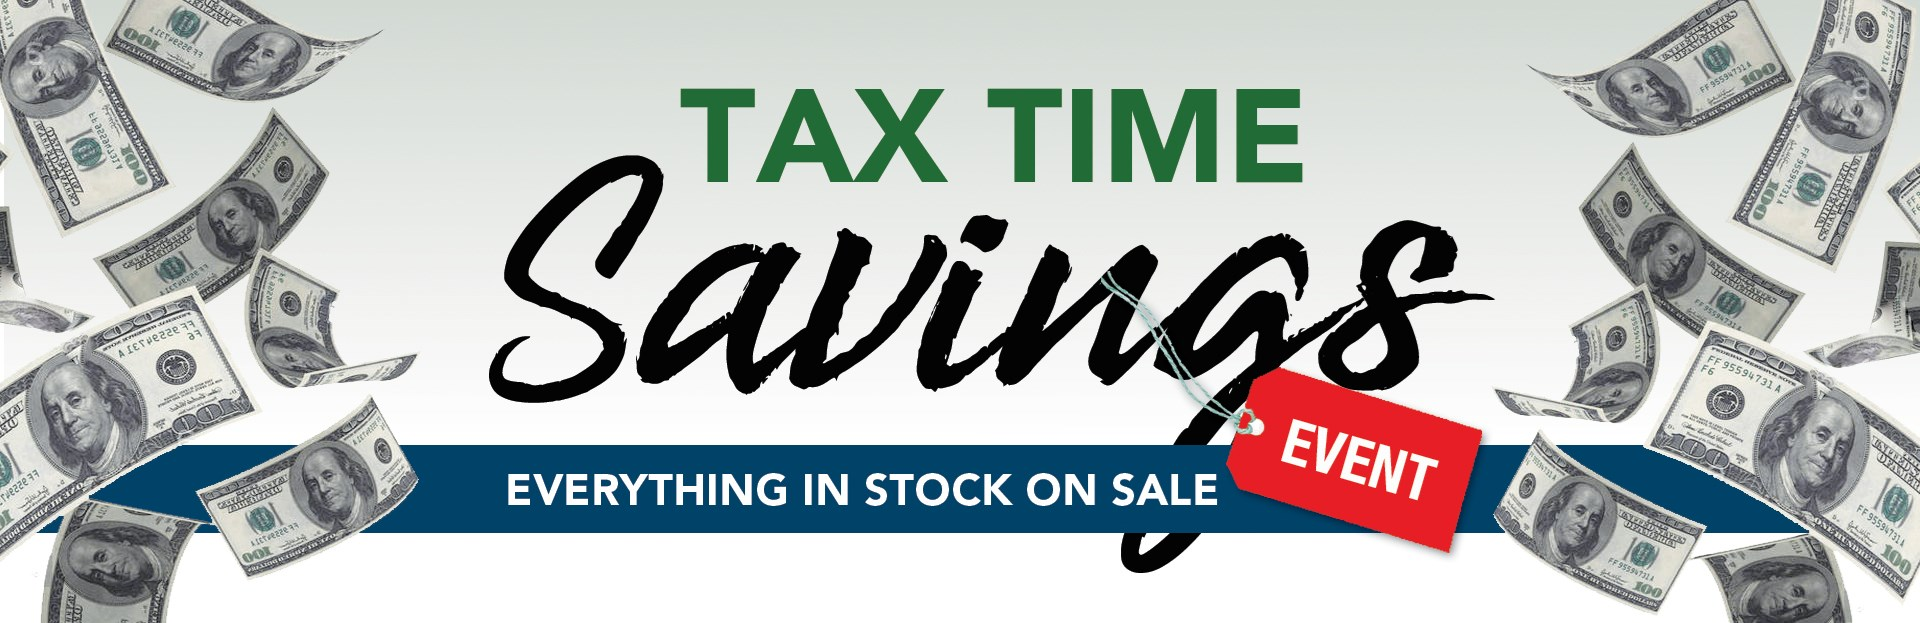 Tax Time Sale